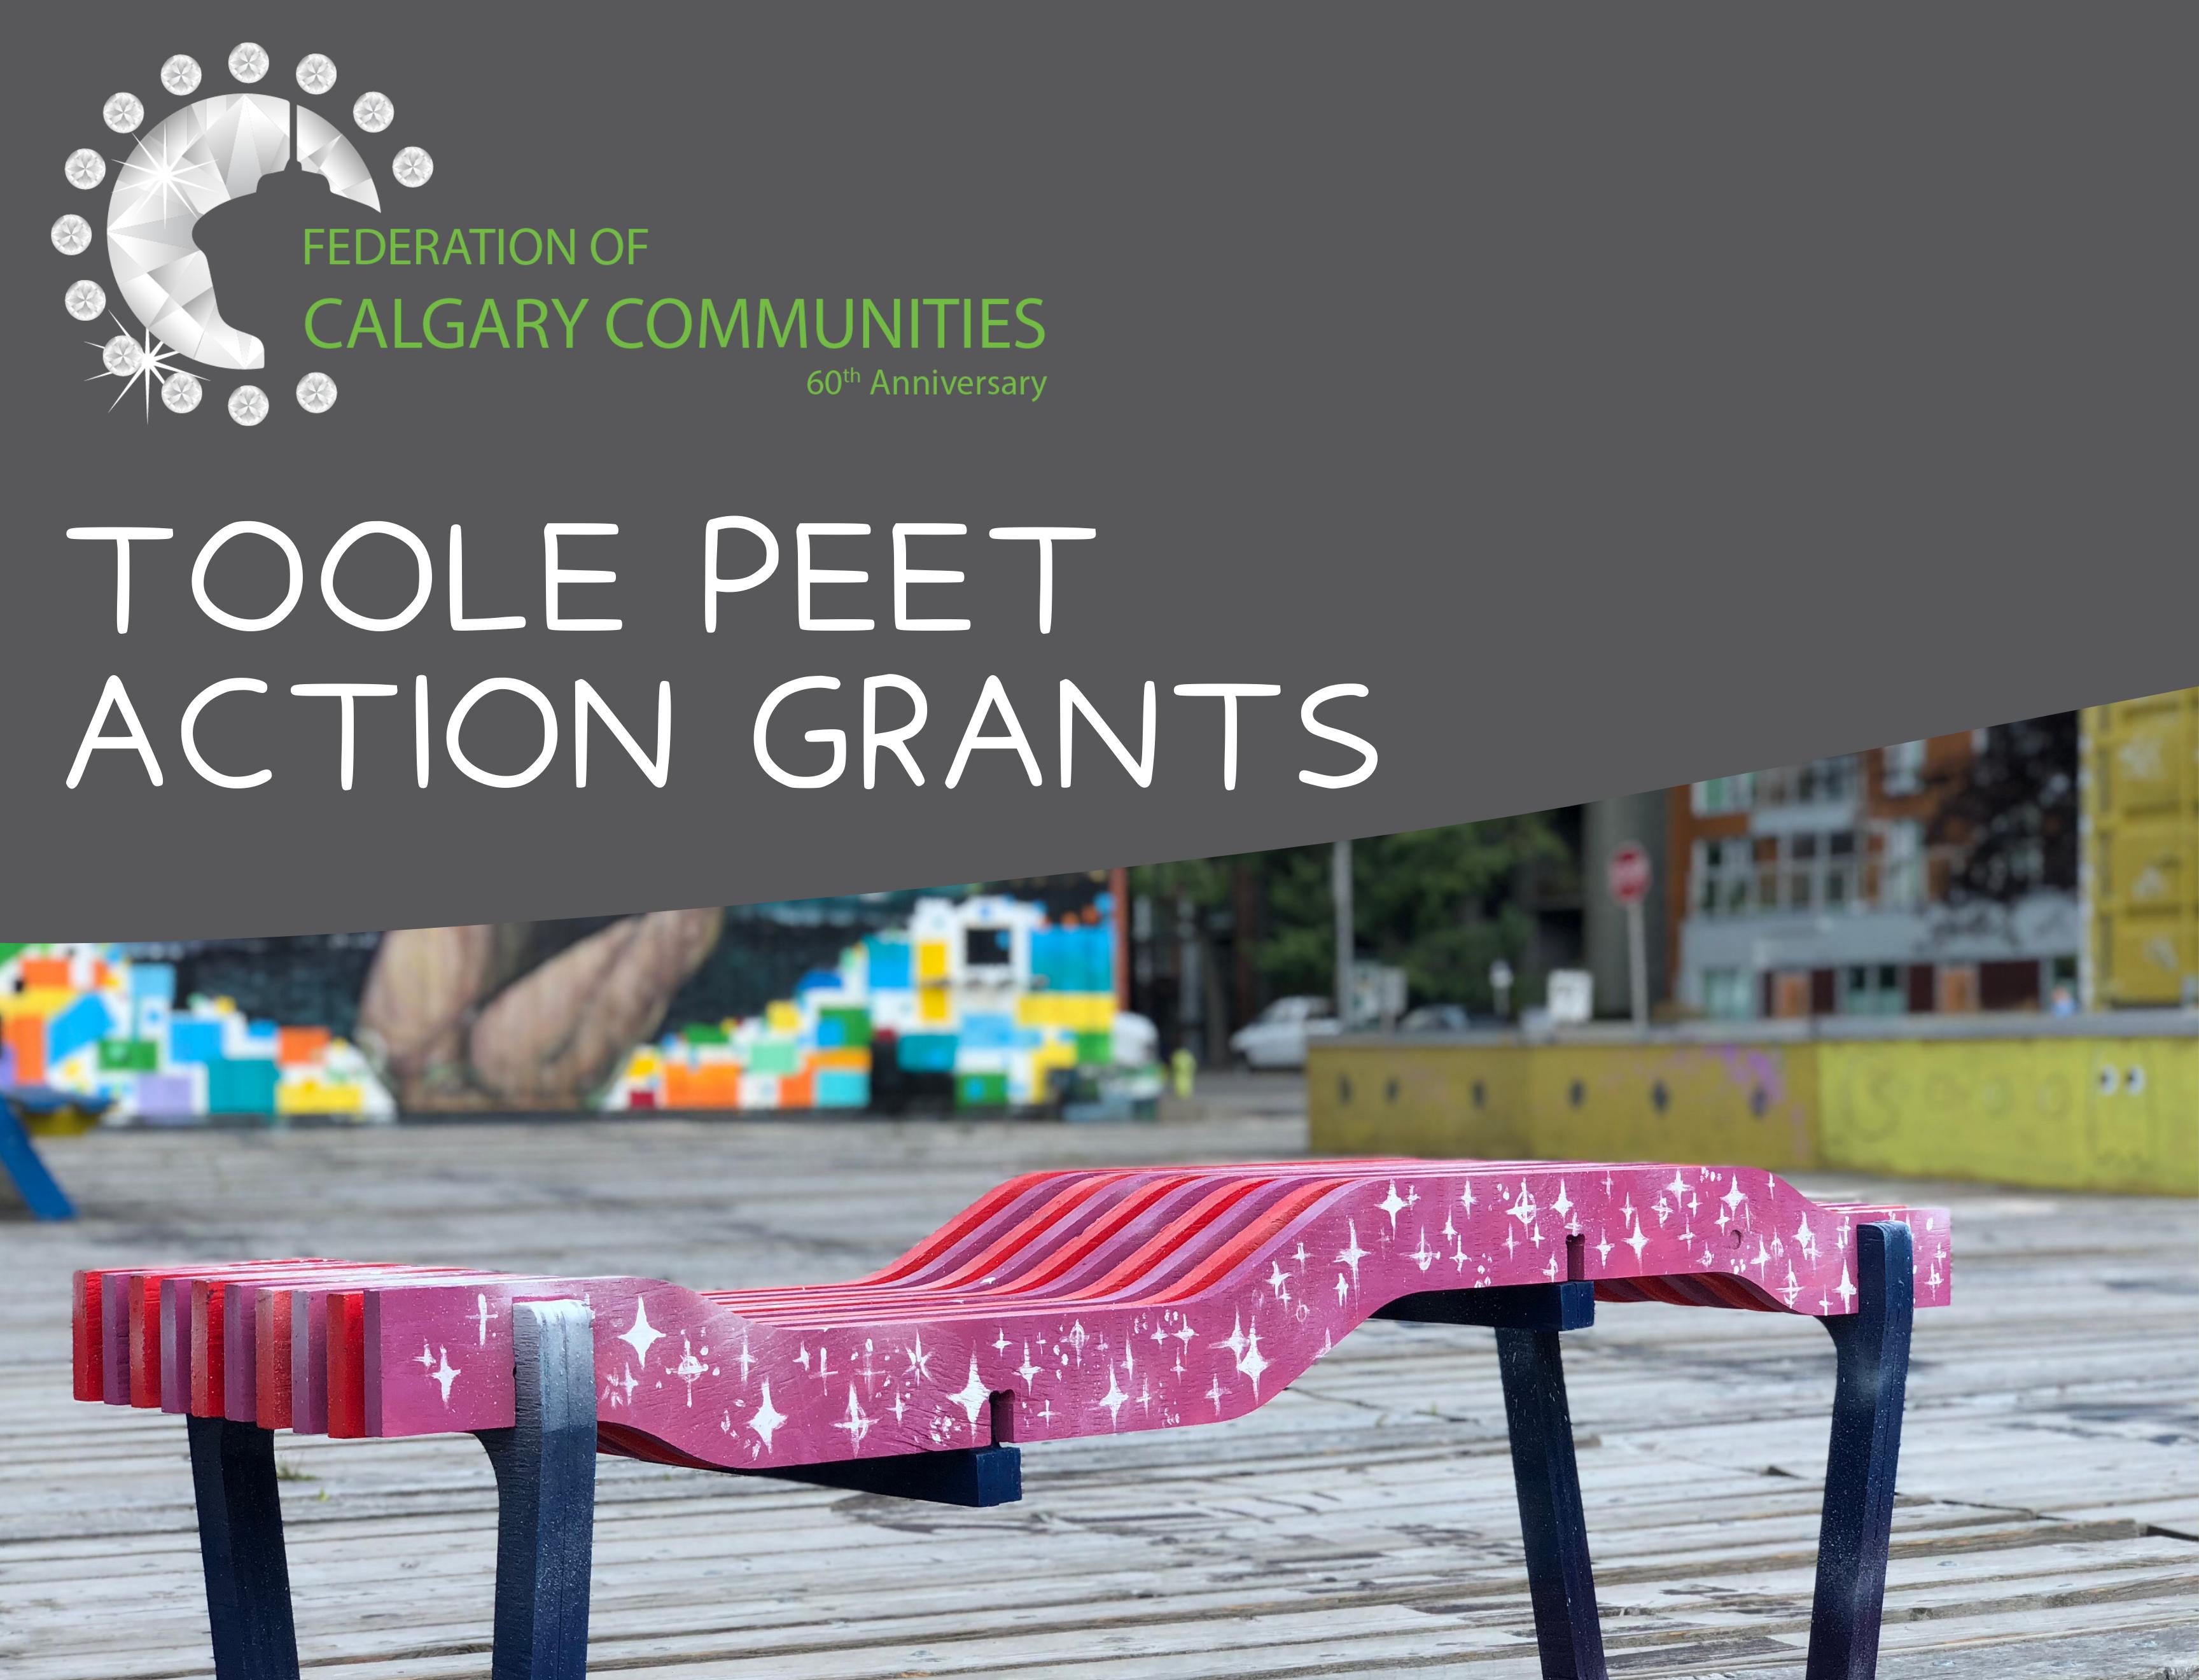 Toole Peet Action Grants Card